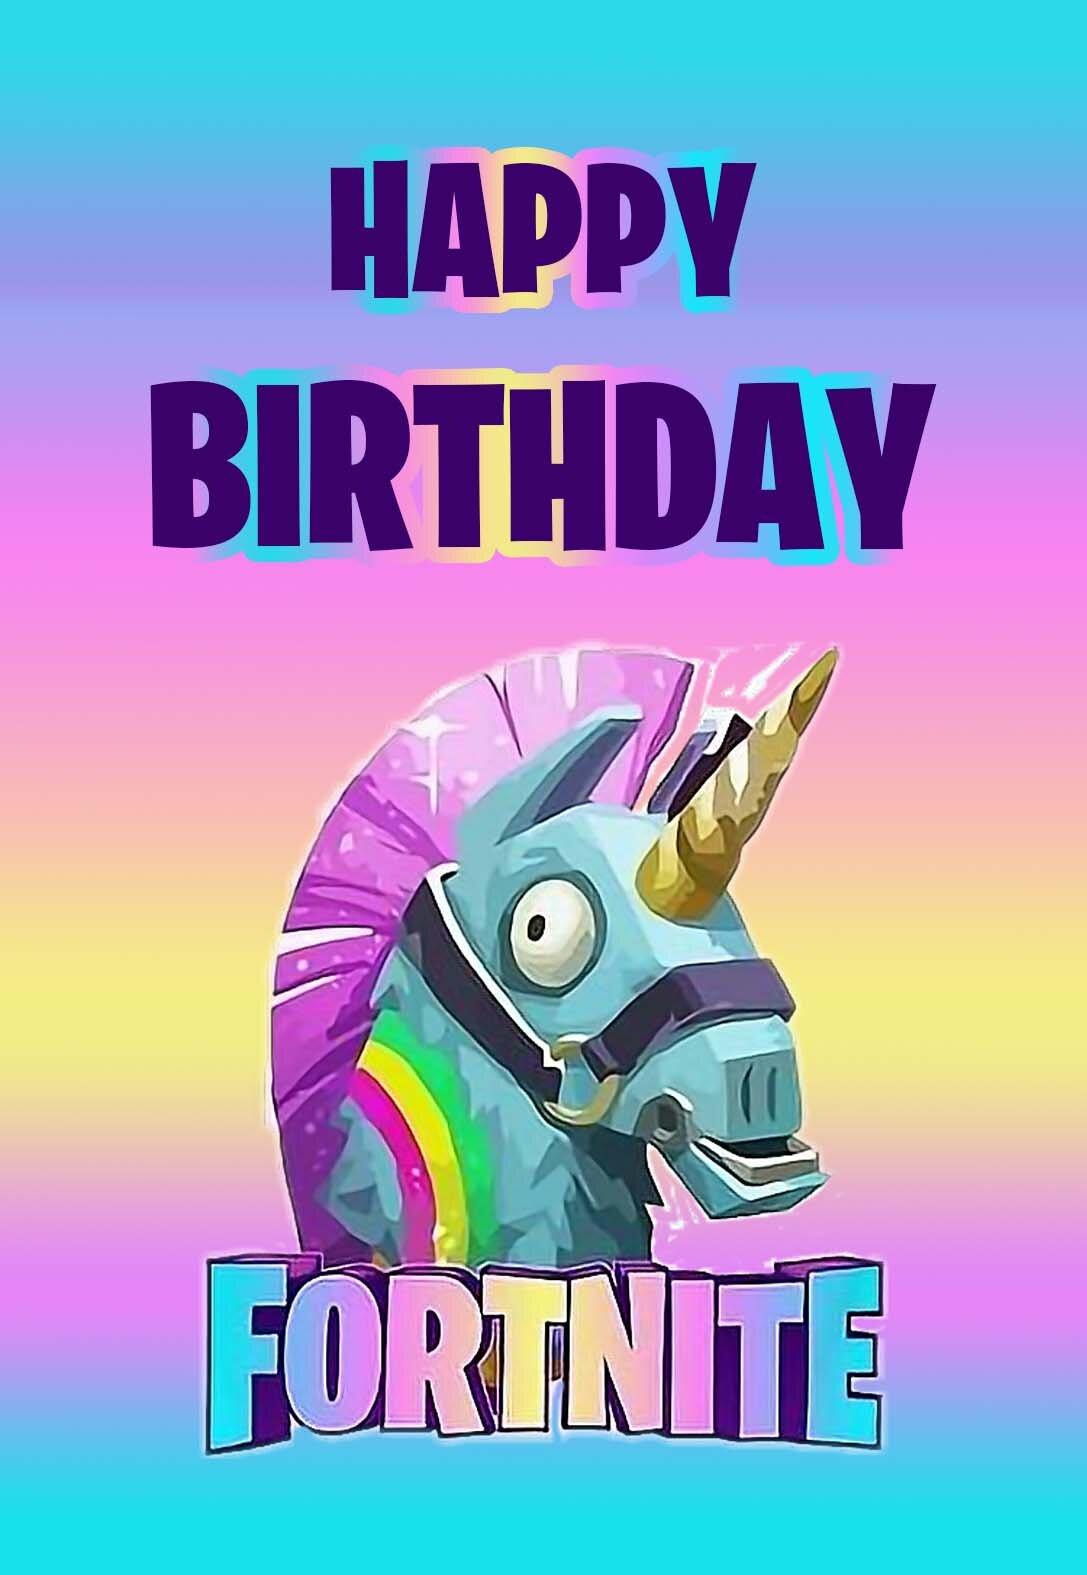 Fortnite Printable Birthday Cards — PRINTBIRTHDAY.CARDS